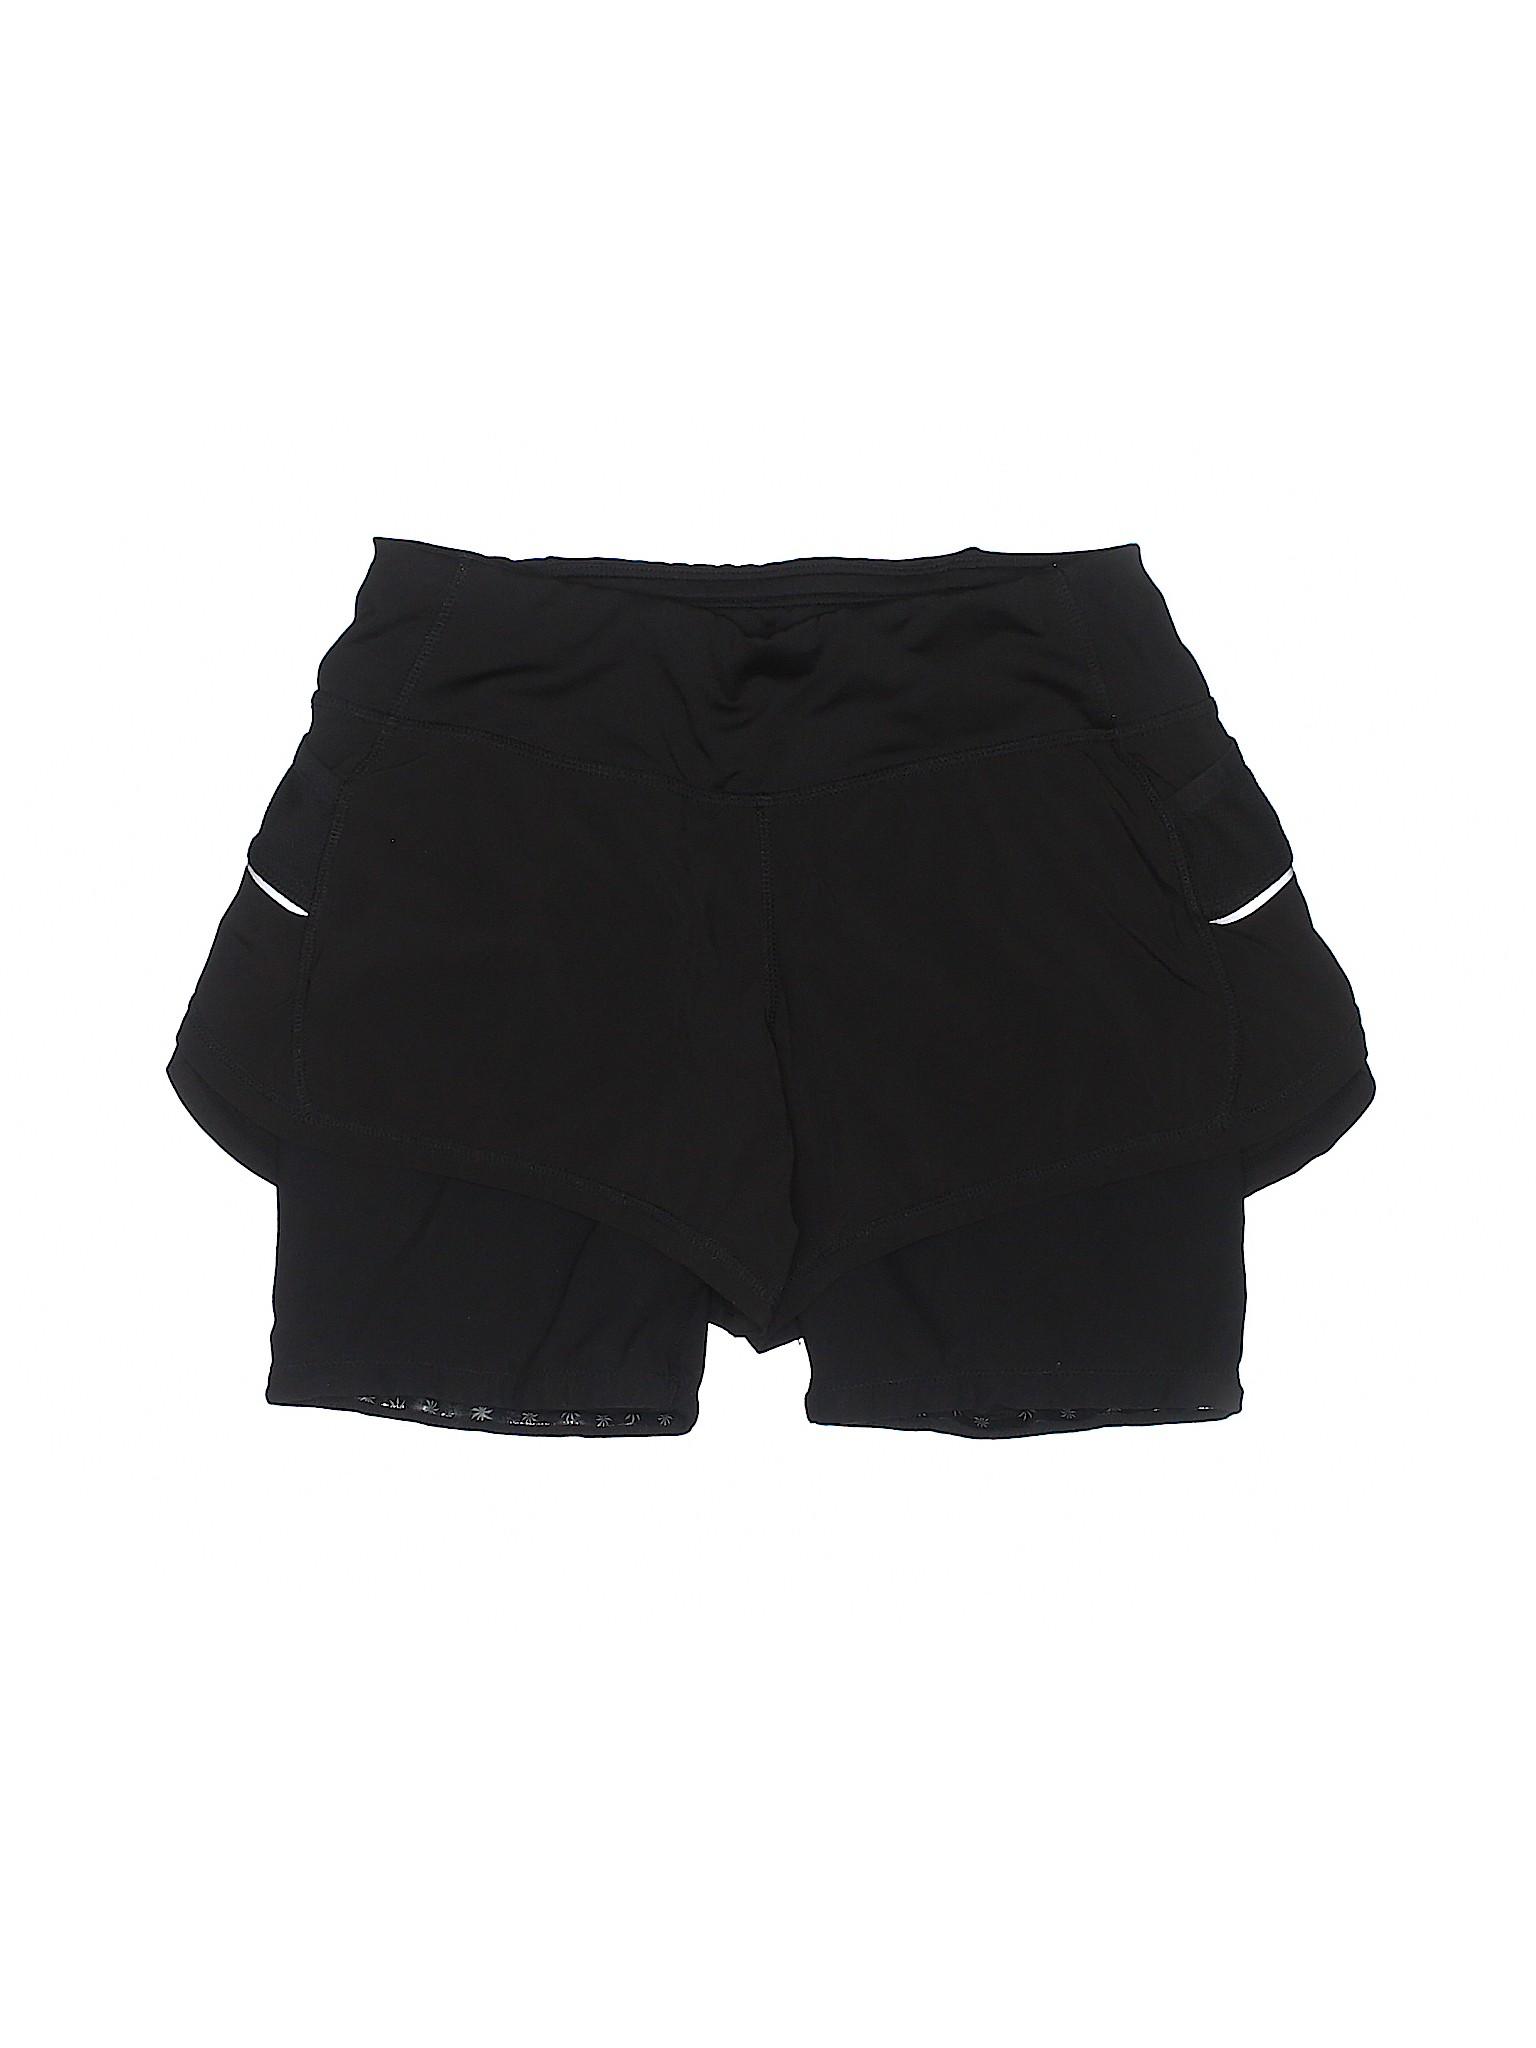 Athleta Boutique Athletic Athletic Athleta Shorts Shorts Boutique Boutique Shorts Athletic Athleta 5zxw06Sxpq